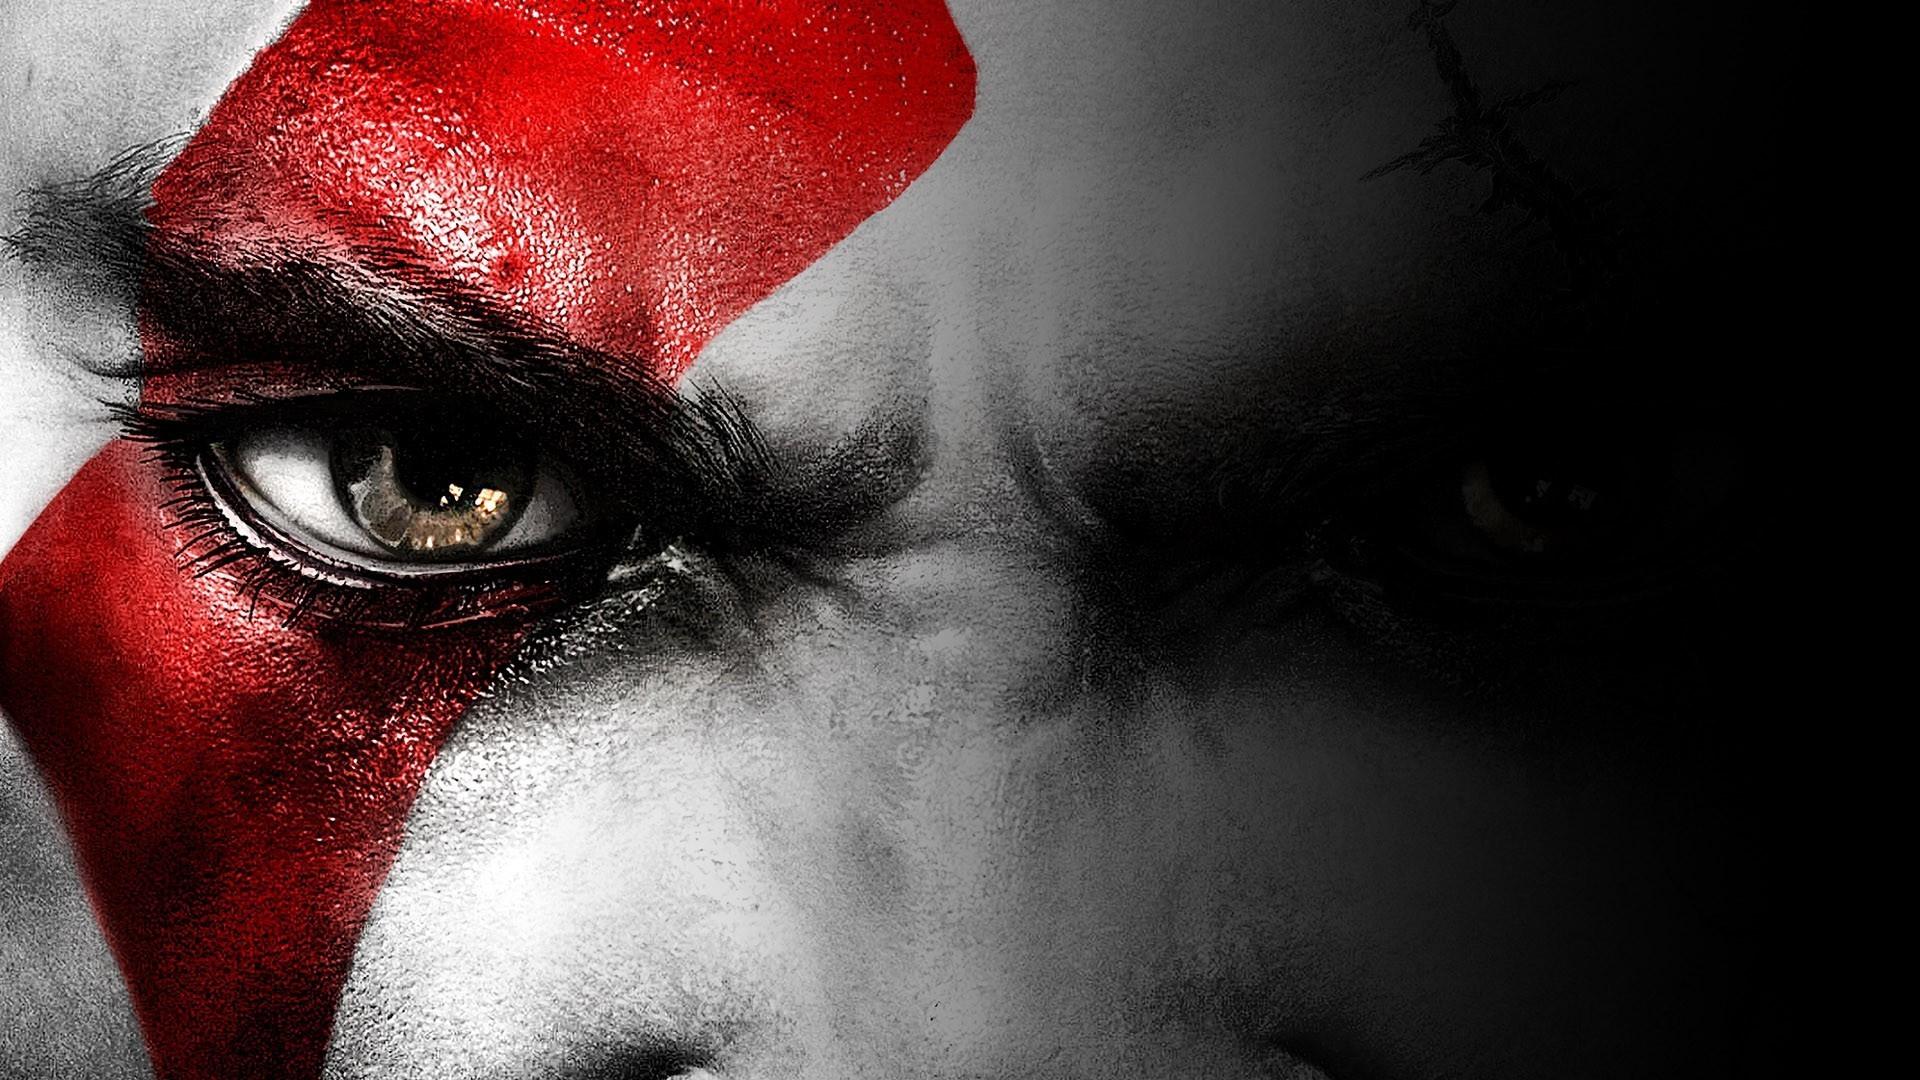 God of war wallpaper 82 images - Wallpaper kratos ...